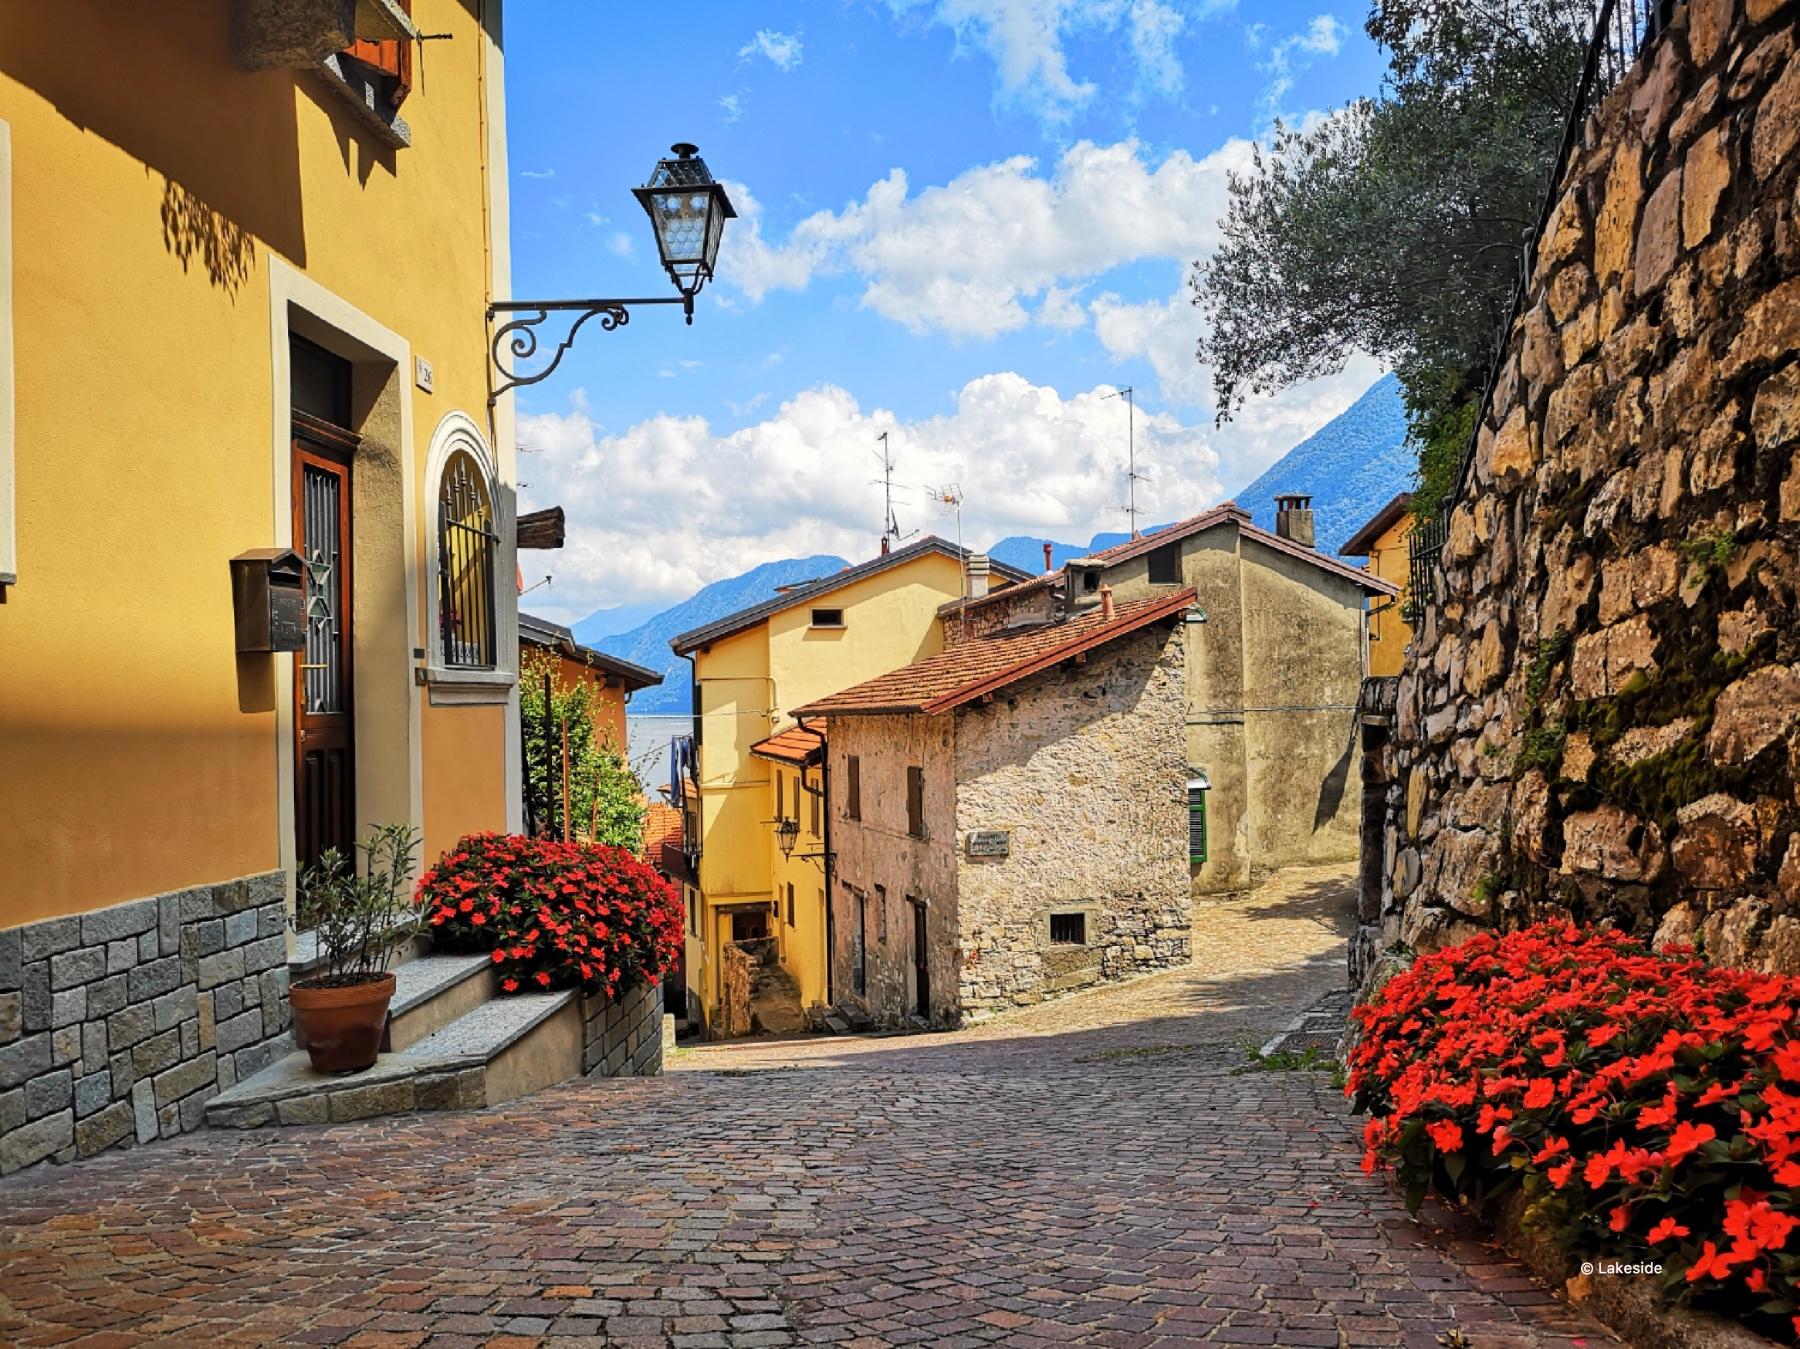 The romantic alleys leading towards Castello district